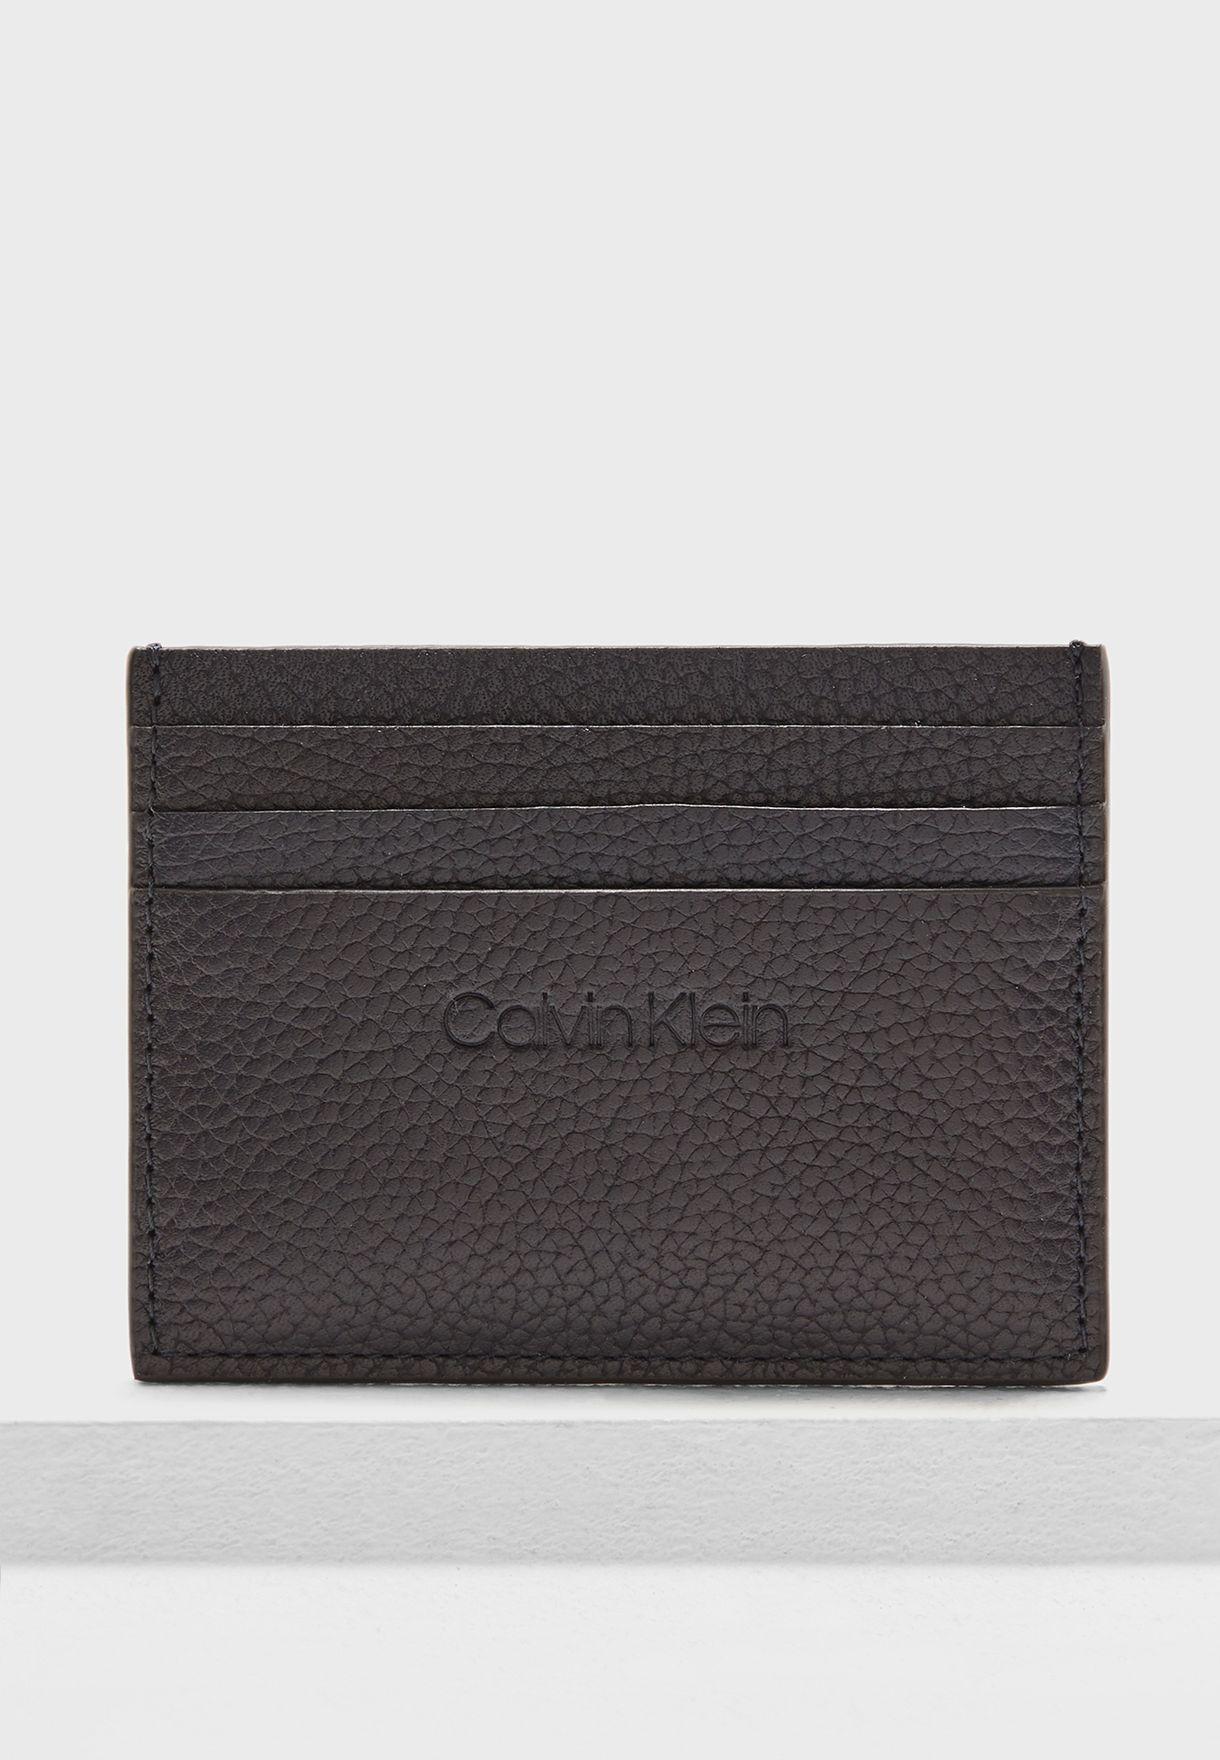 Essential Leather Cardholder